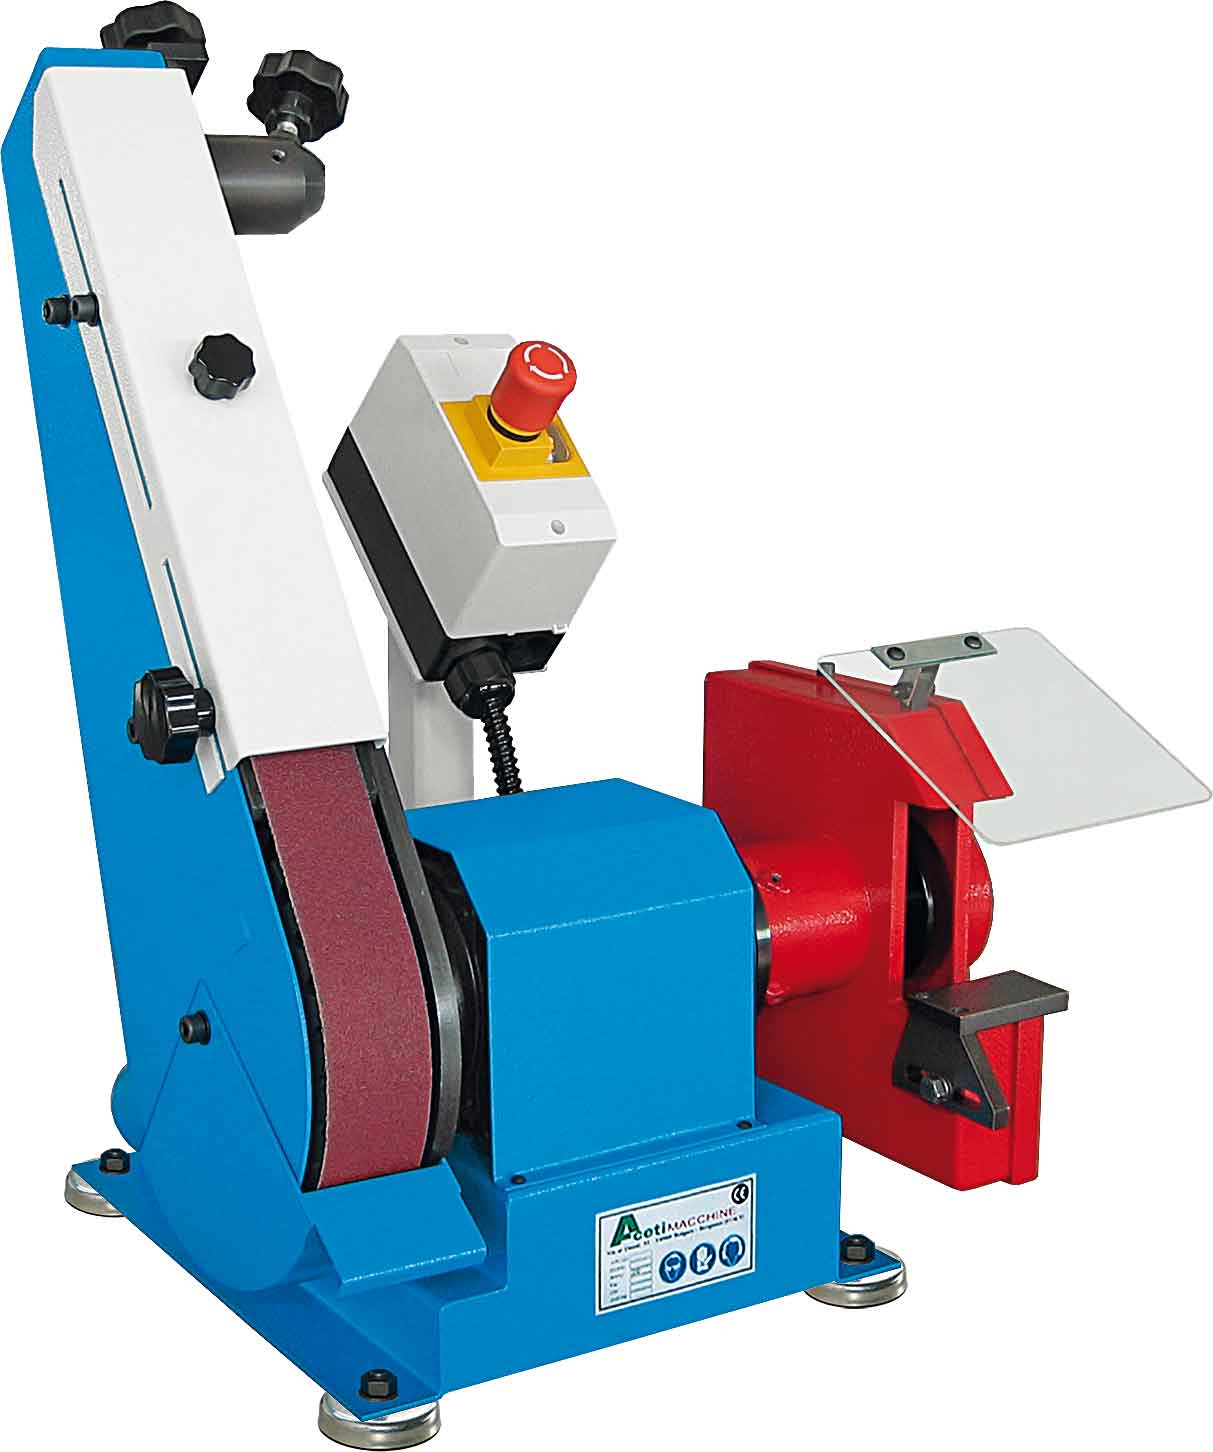 ART.136 - Belt grinding machine